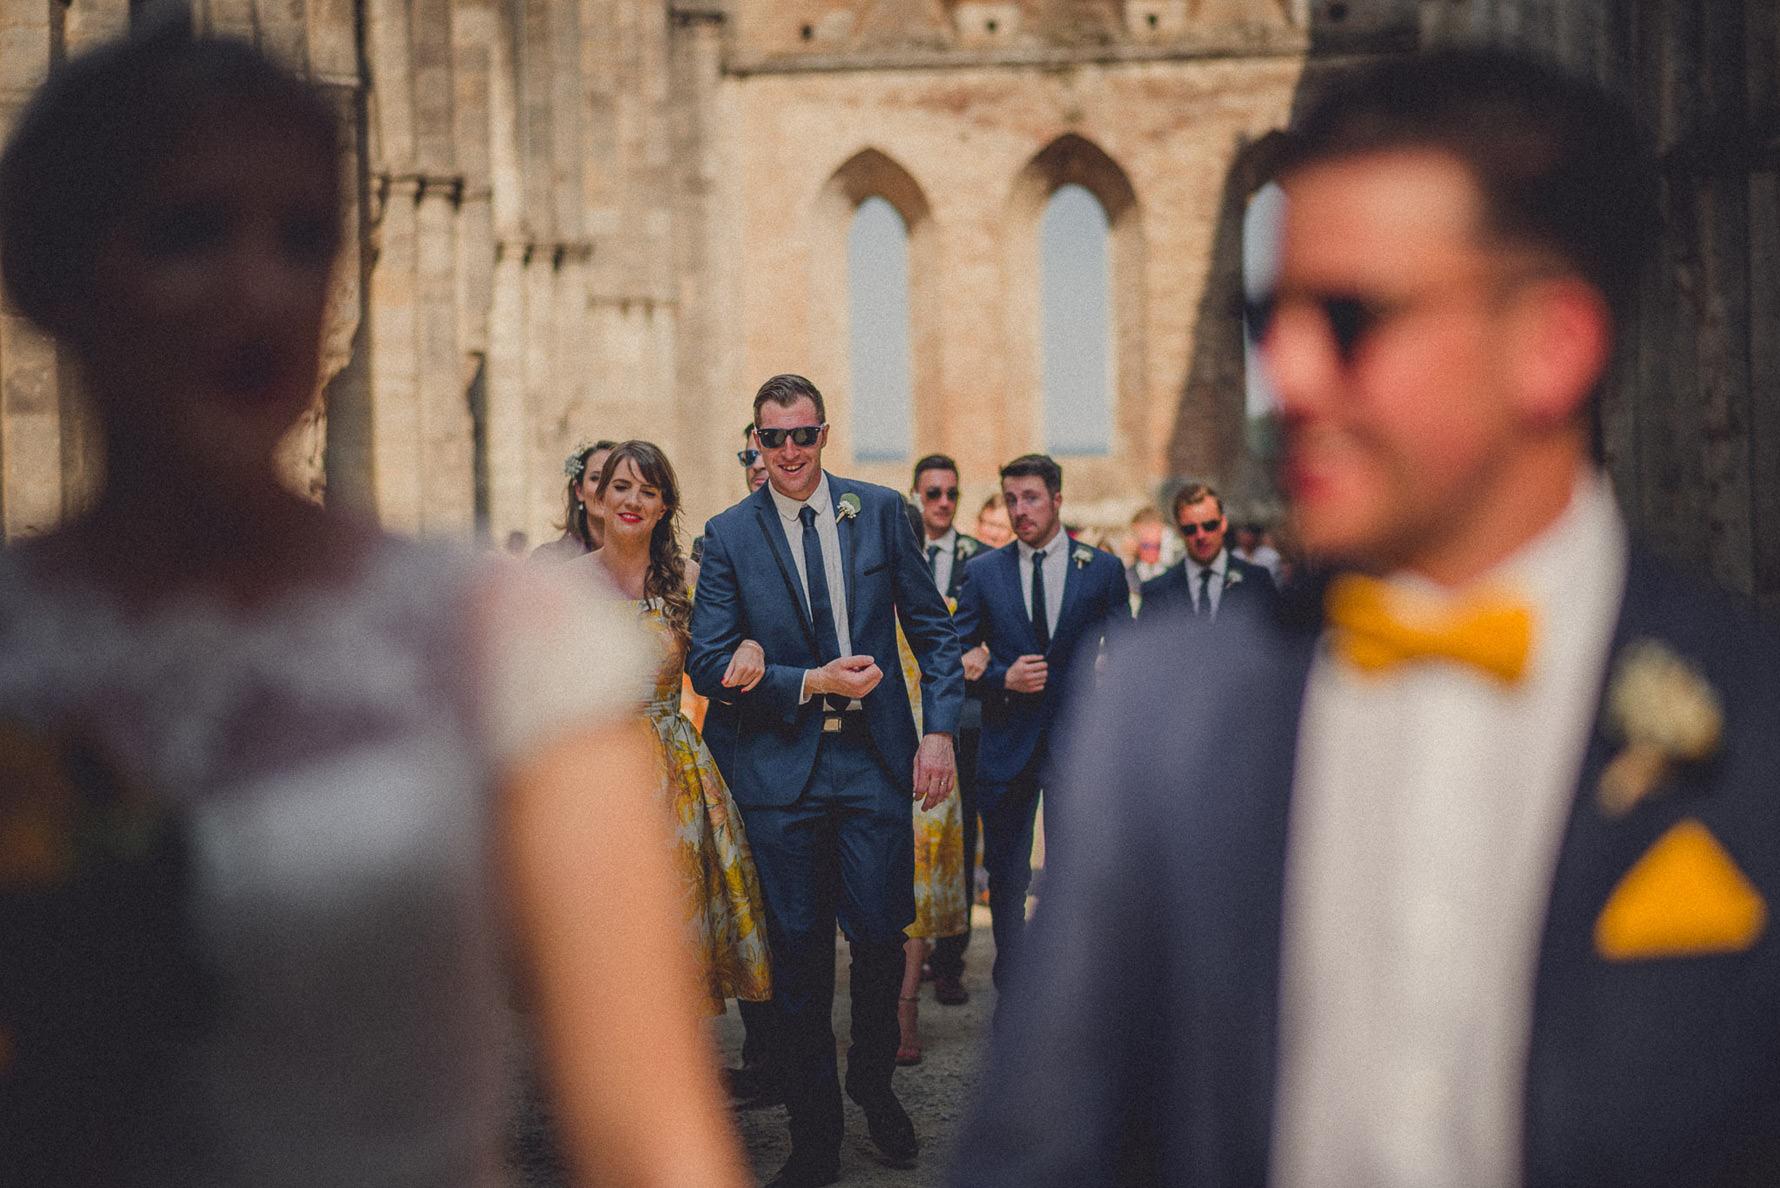 saint-galgano-abbey-wedding-photographer-livio-lacurre-photography